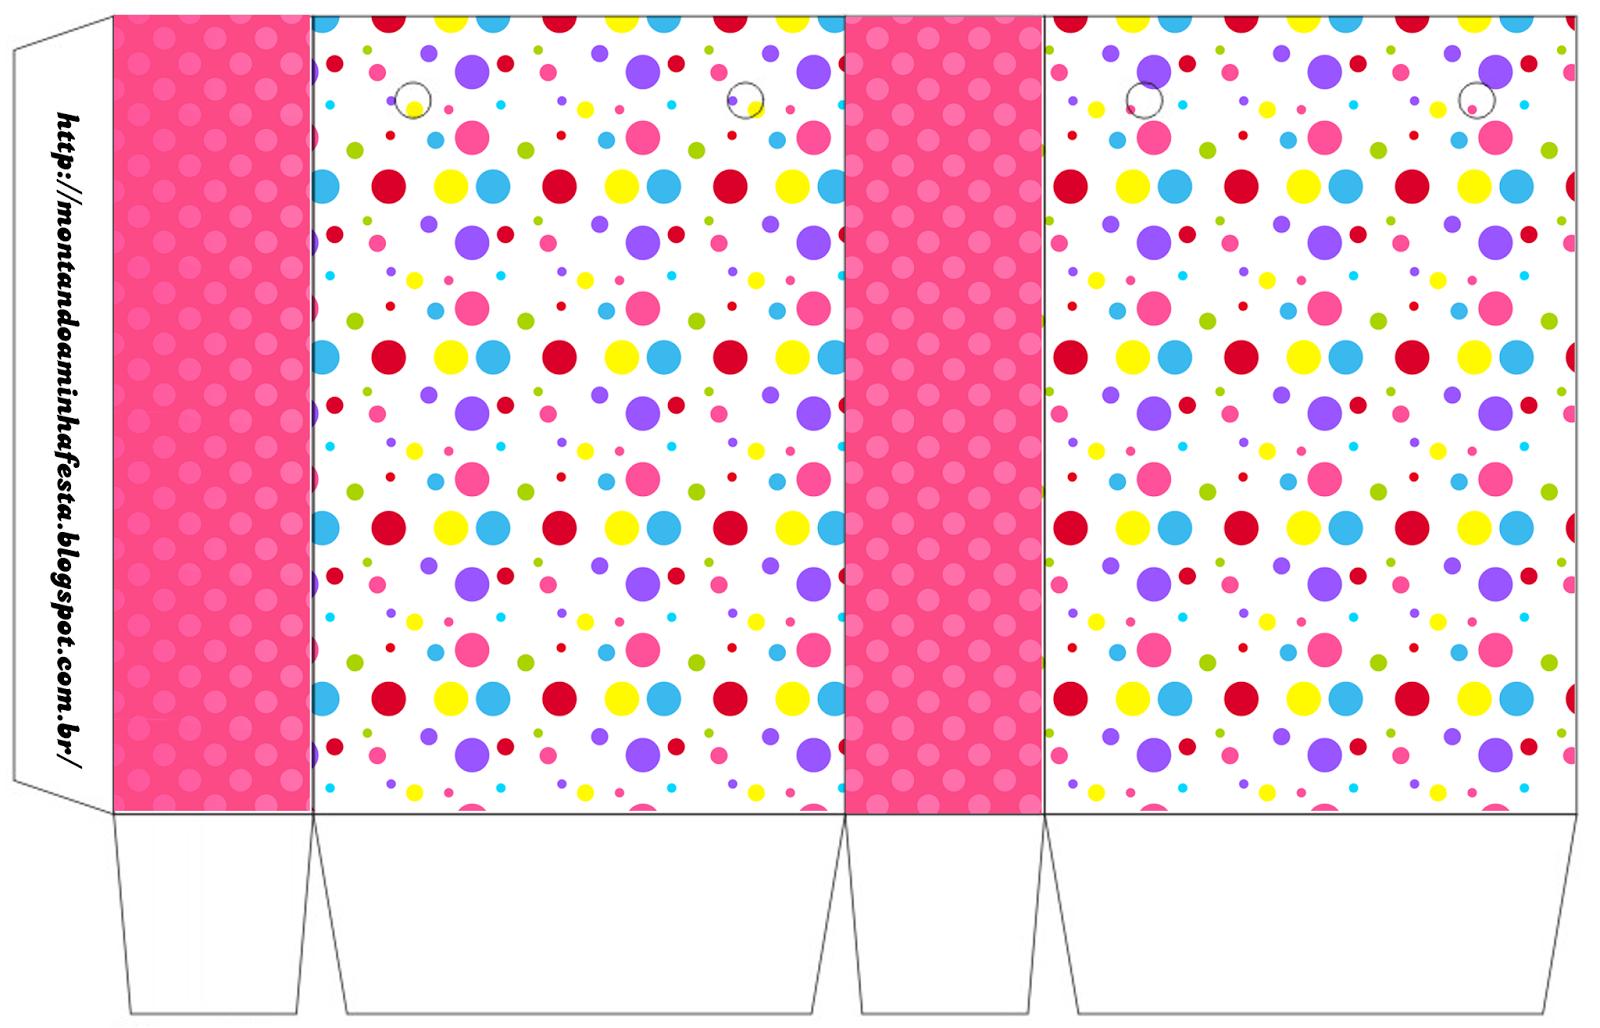 Puntos De Colores Para Niña: Cajas Para Imprimir Gratis